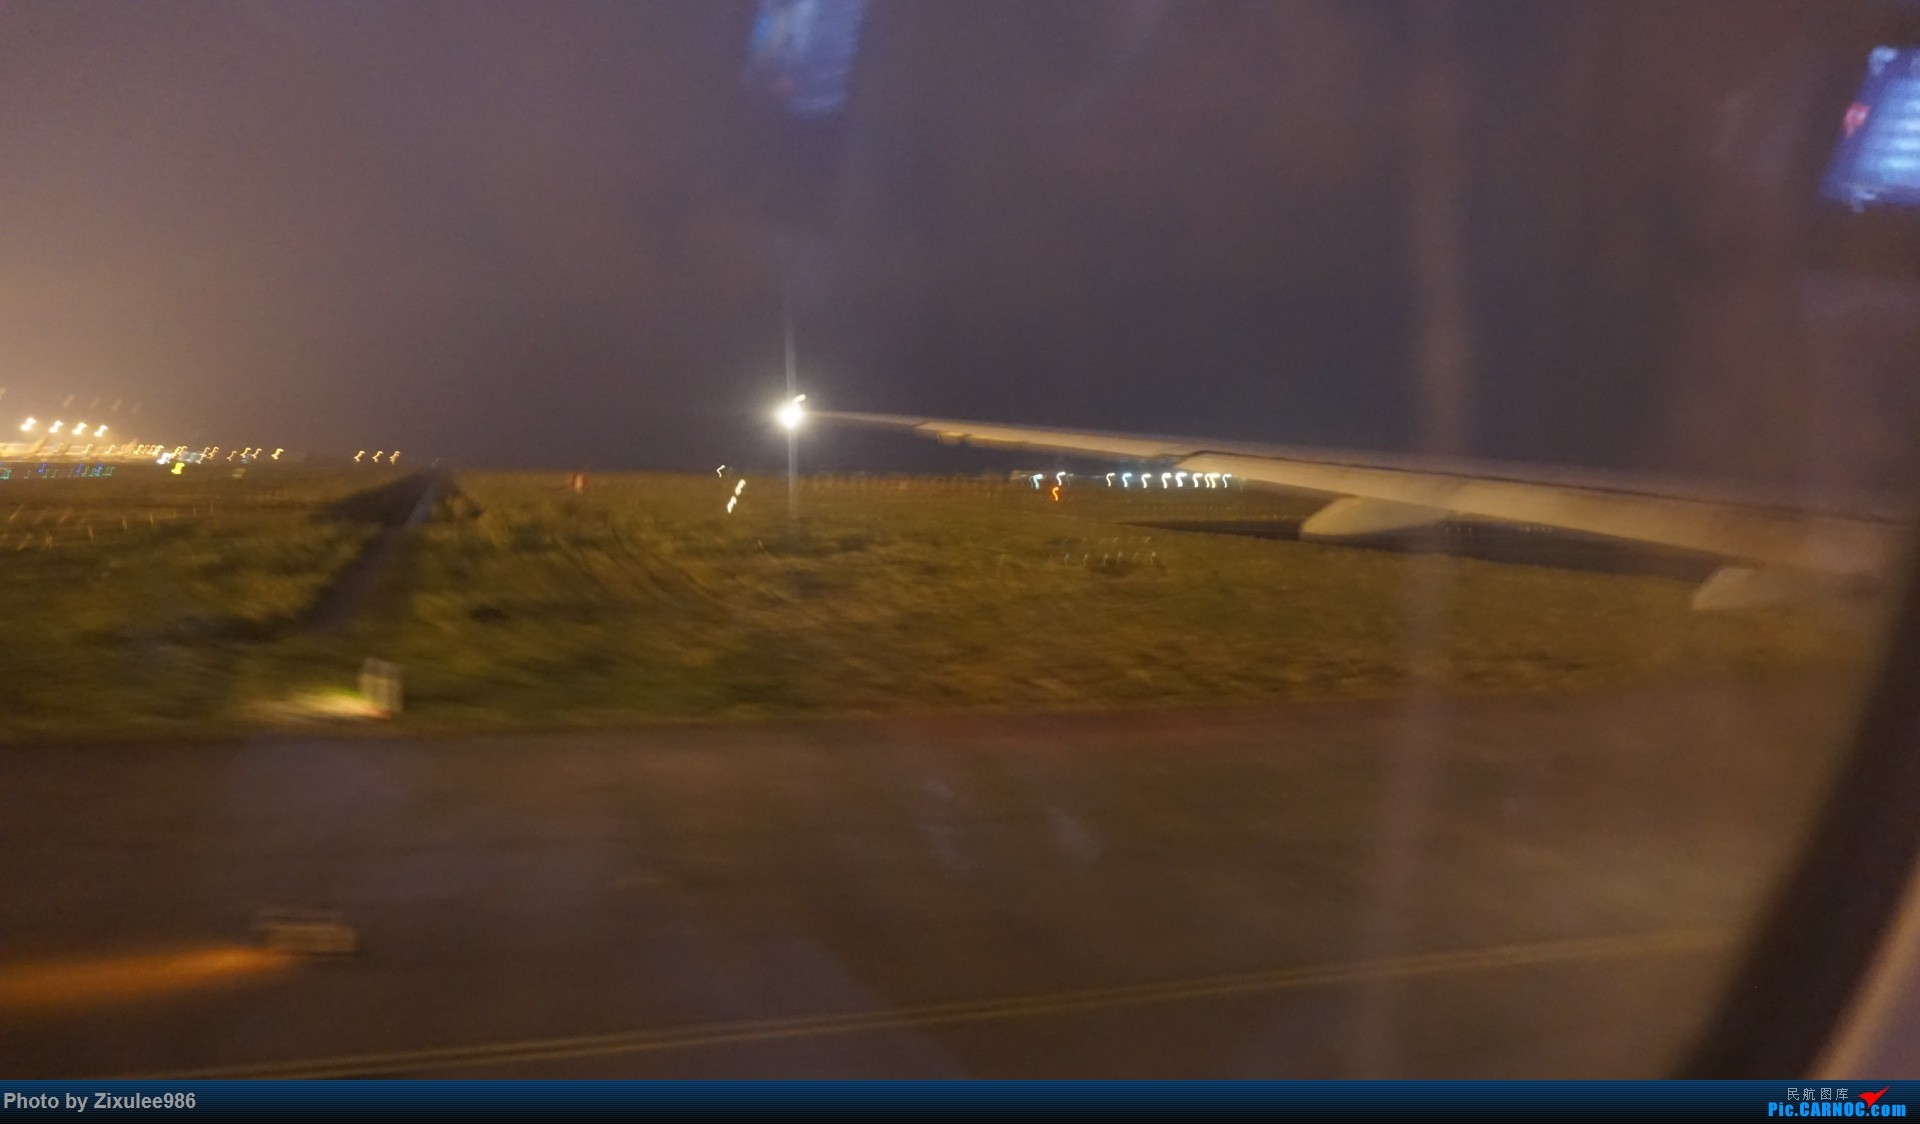 Re:[原创]加拿大21日游学之旅 (二)~加航AC28..PVG-YYZ到达多村后的雨天~多图缓更,请各位大侠谅解~ BOEING 777-333(ER) C-FITL 中国上海浦东国际机场